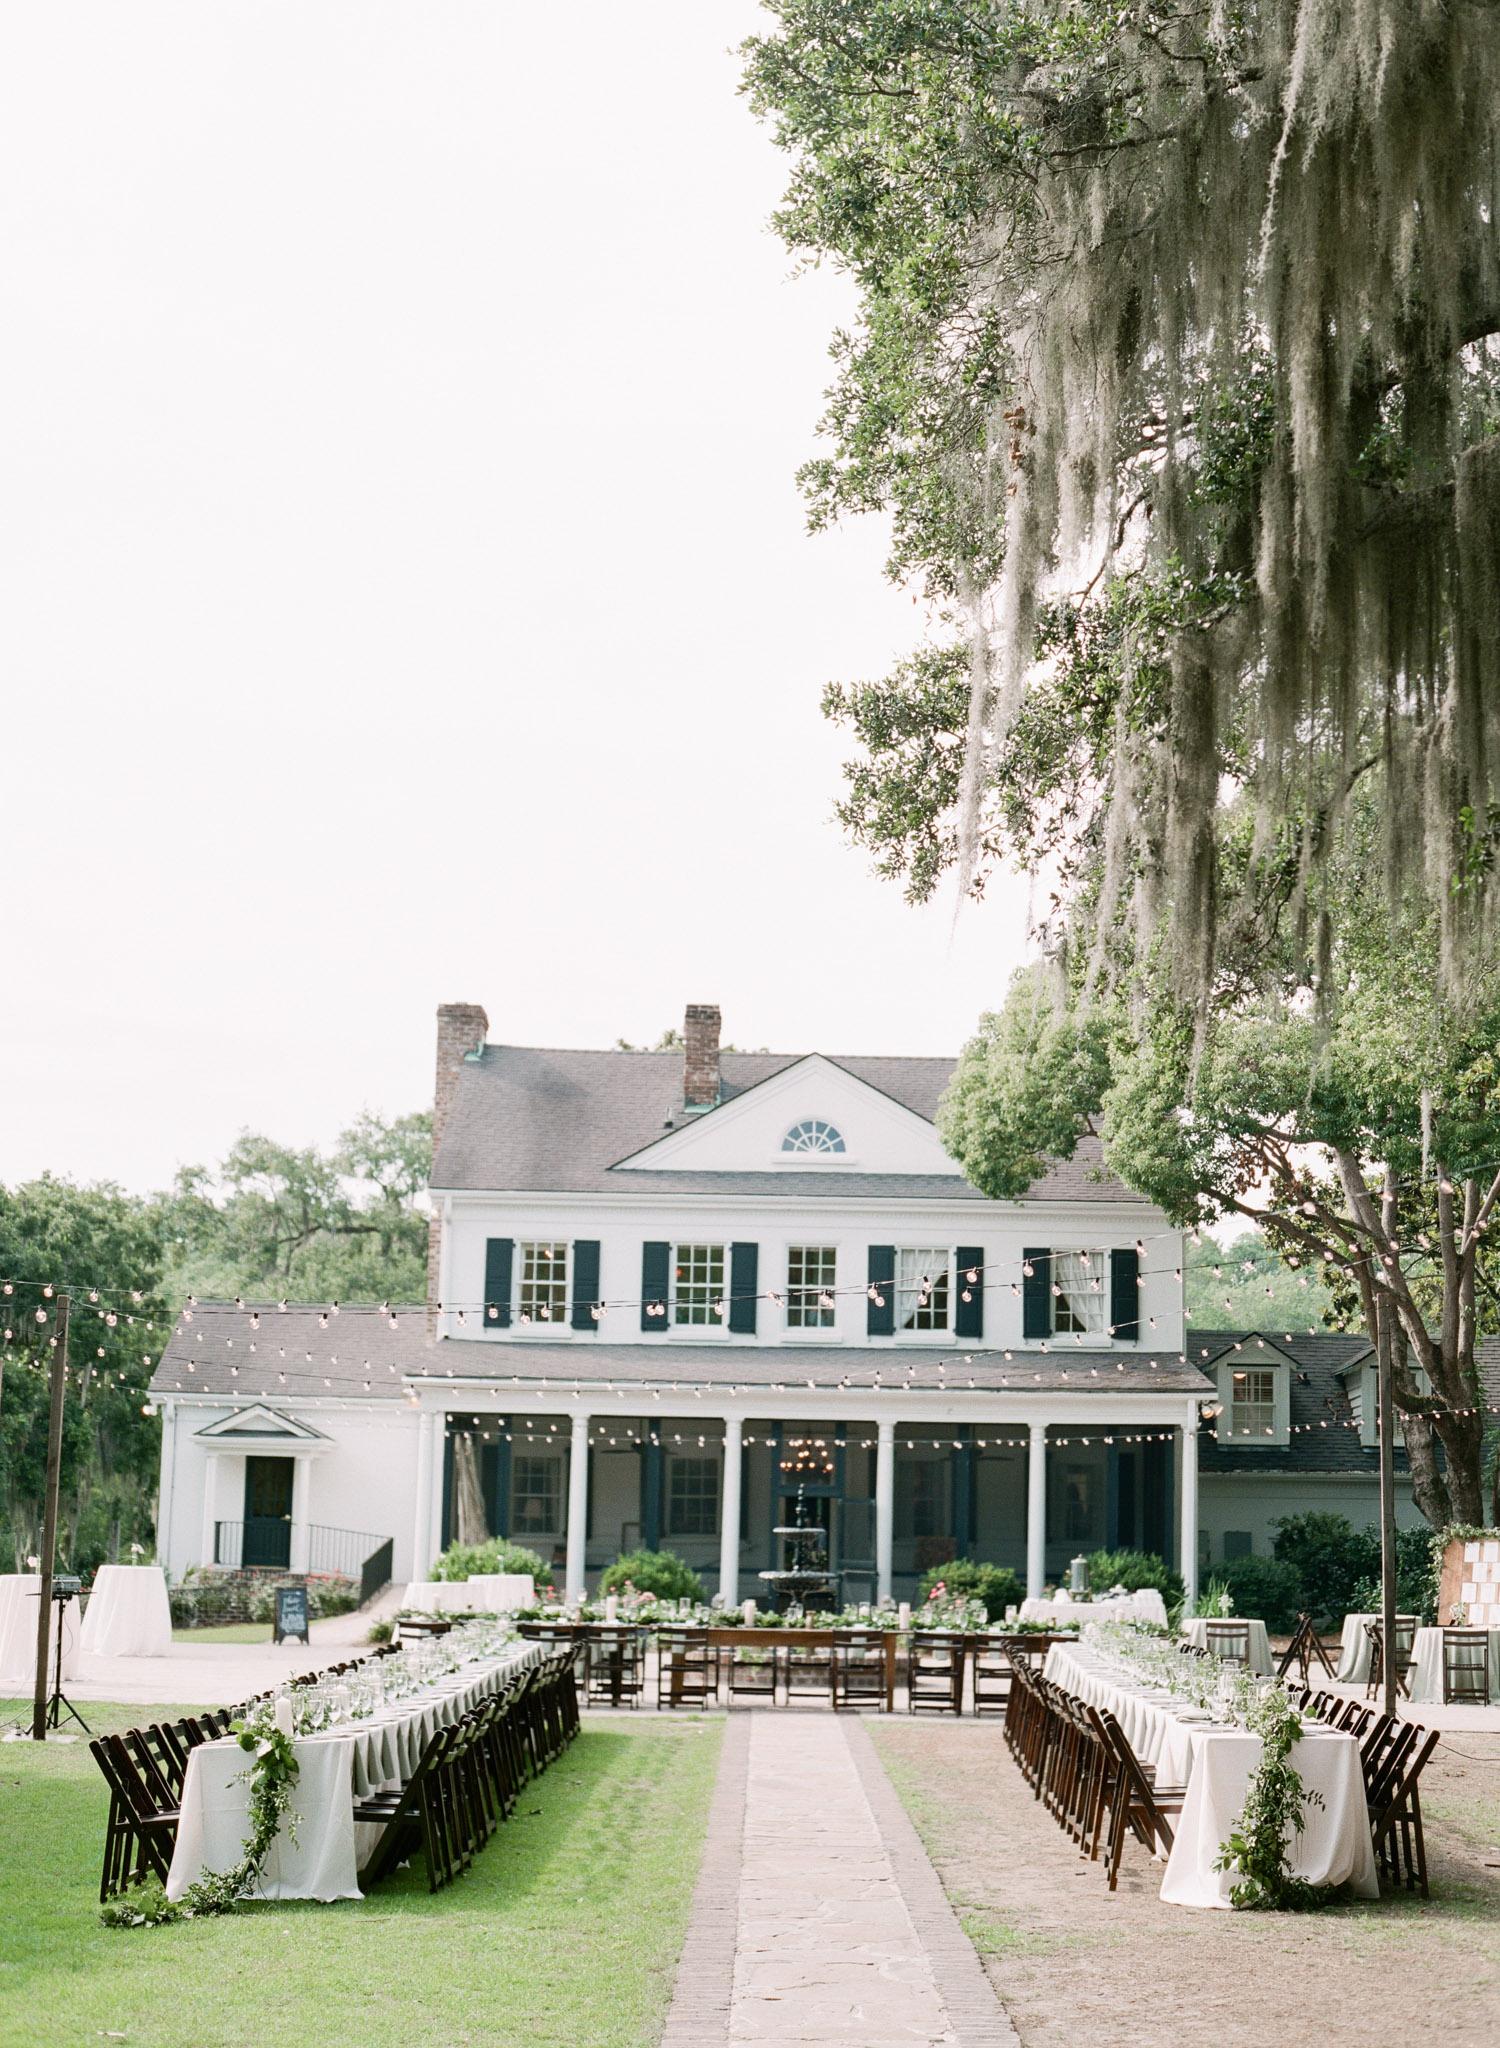 Charleston-Wedding-Venue-Legare-Waring-1.jpg